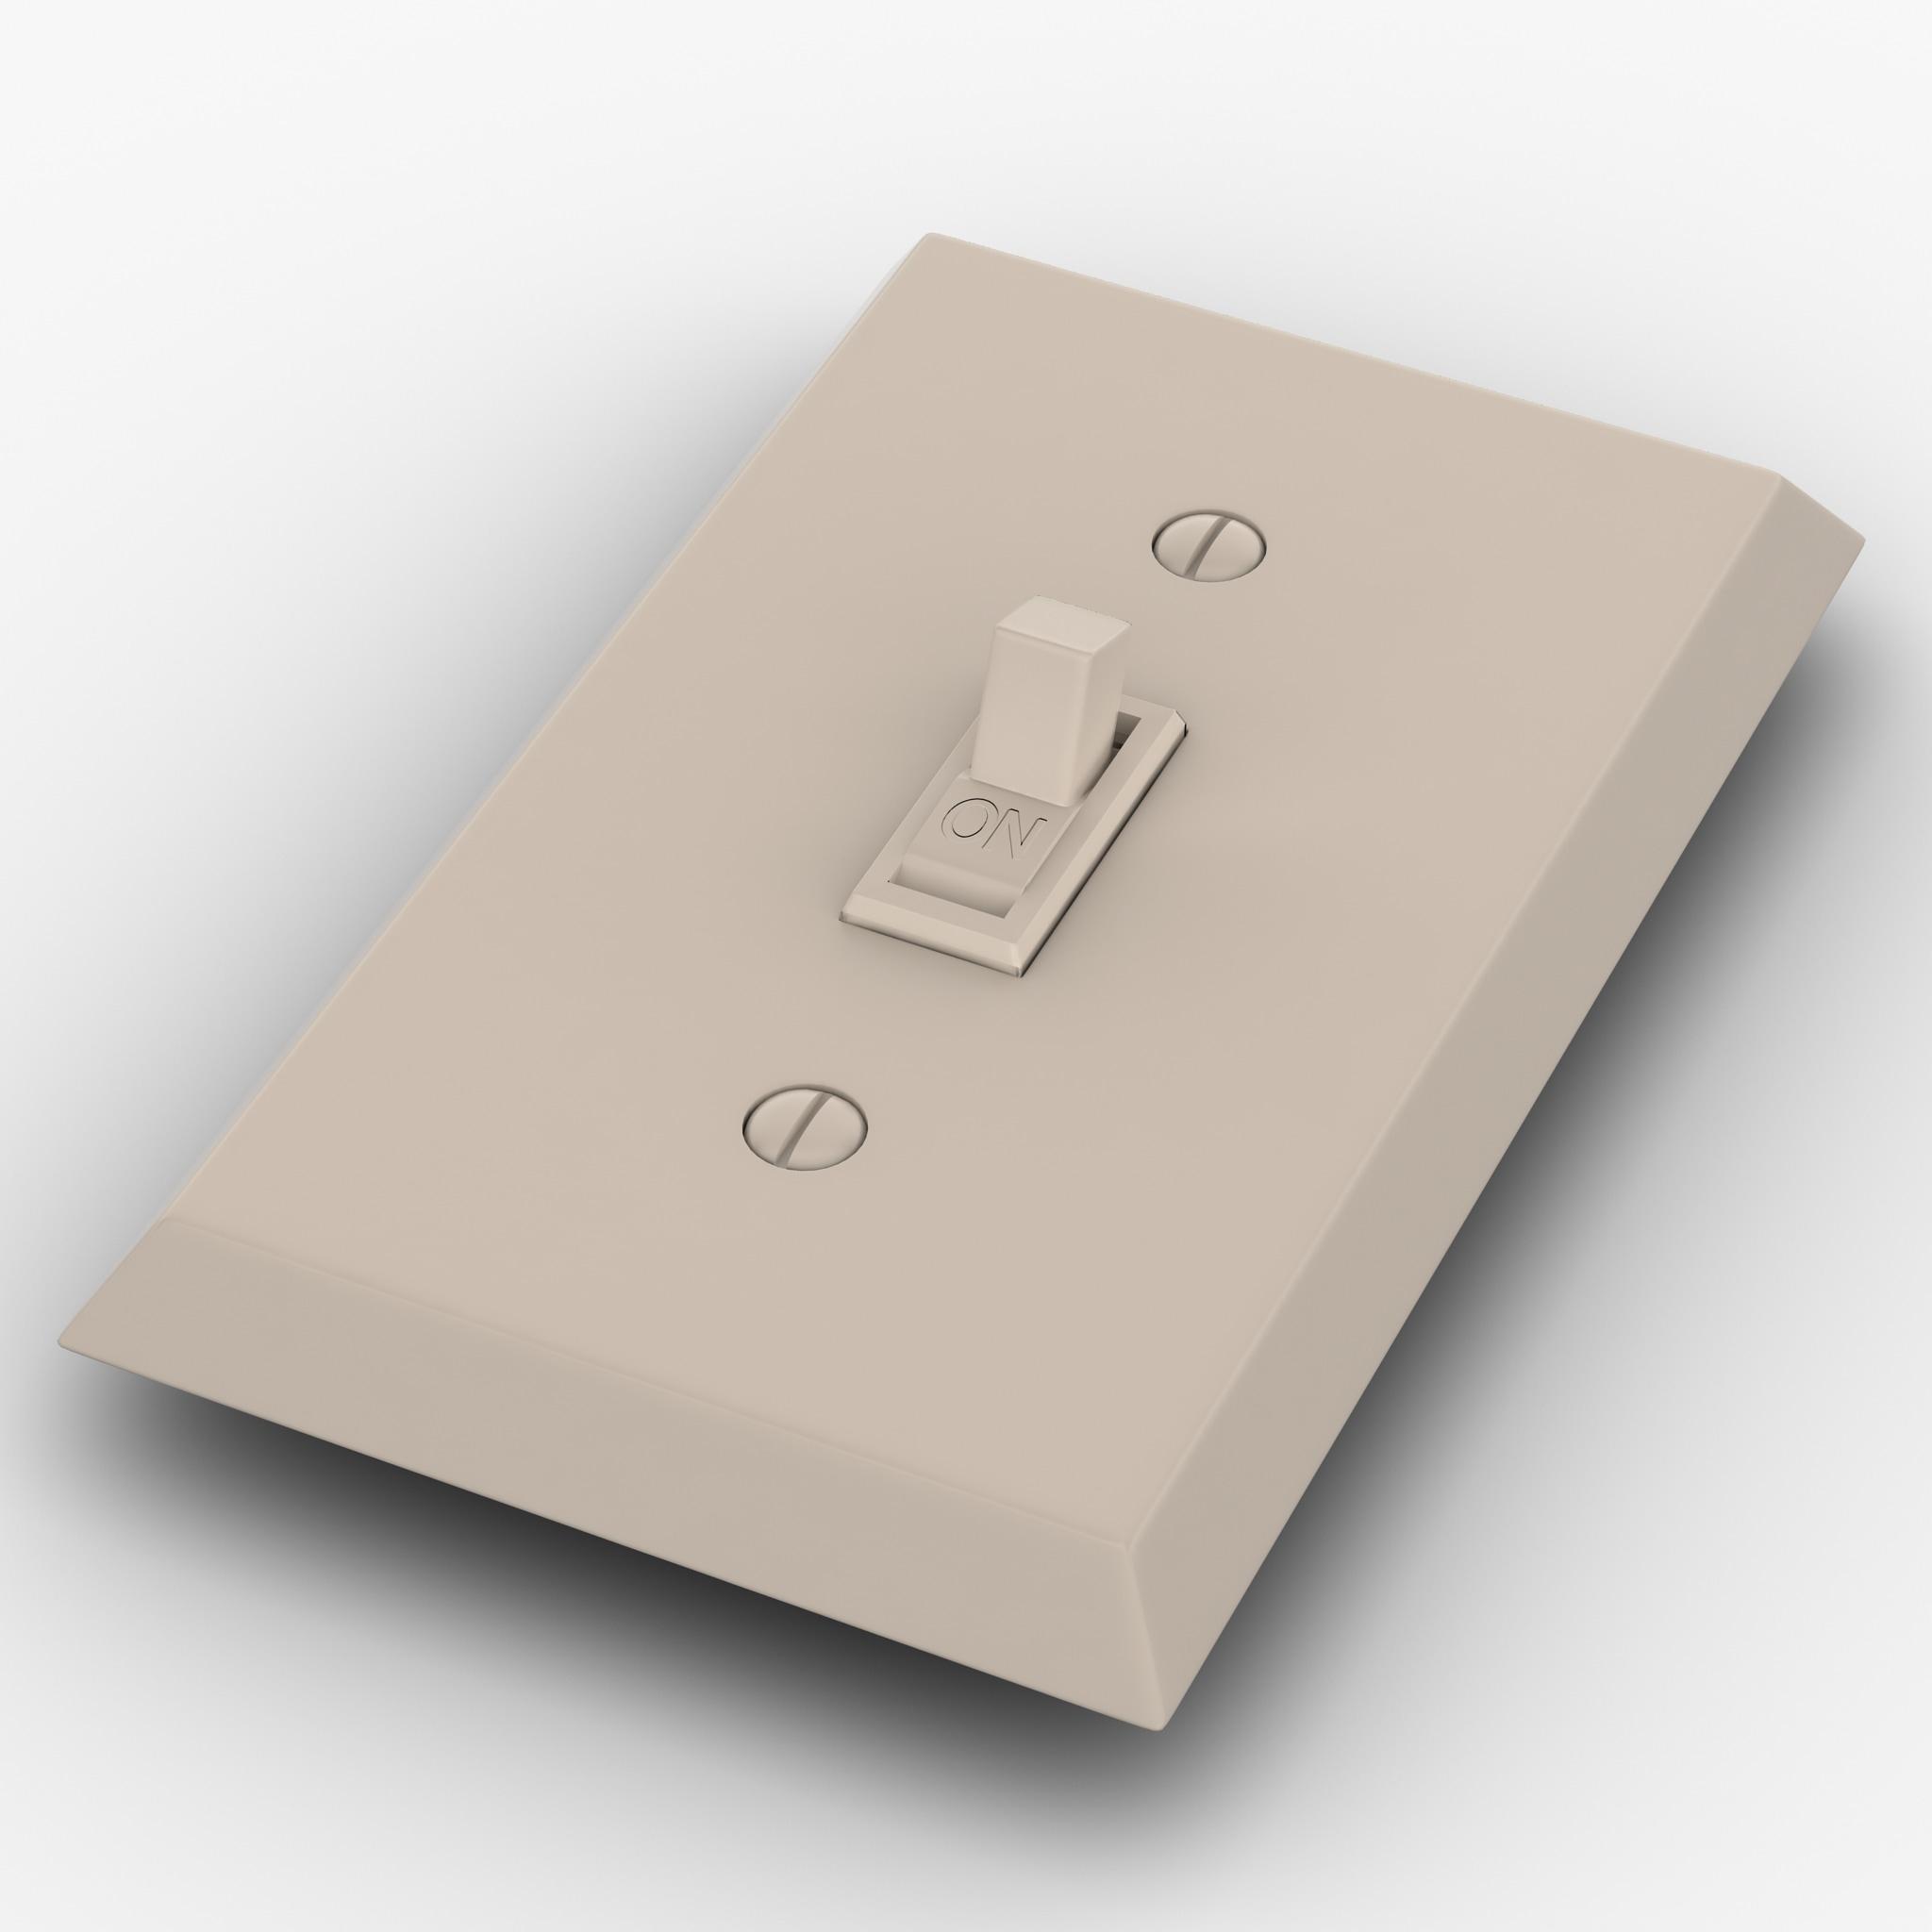 light switch 3d model